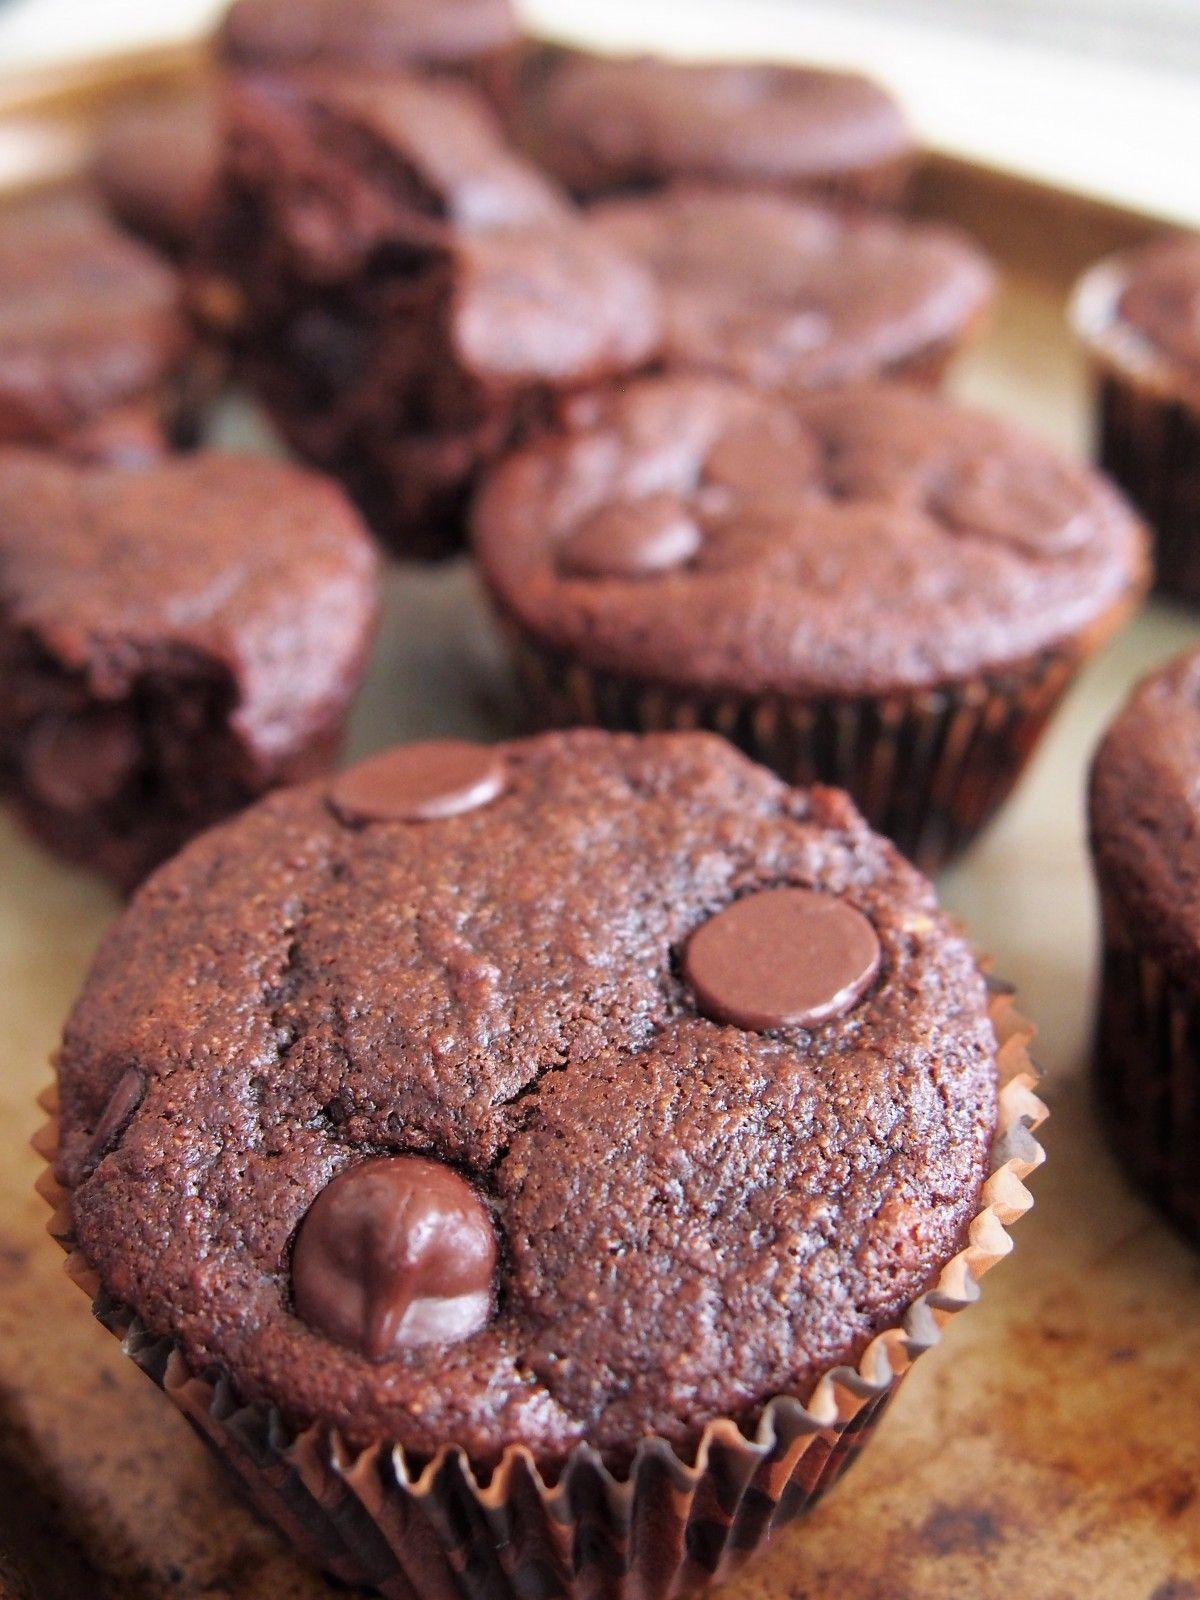 Protein Packed Chocolate Banana Kodiak Cake Muffins Forks In The Road Recipe Kodiak Cake Muffins Baking Mix Recipes Kodiak Cakes